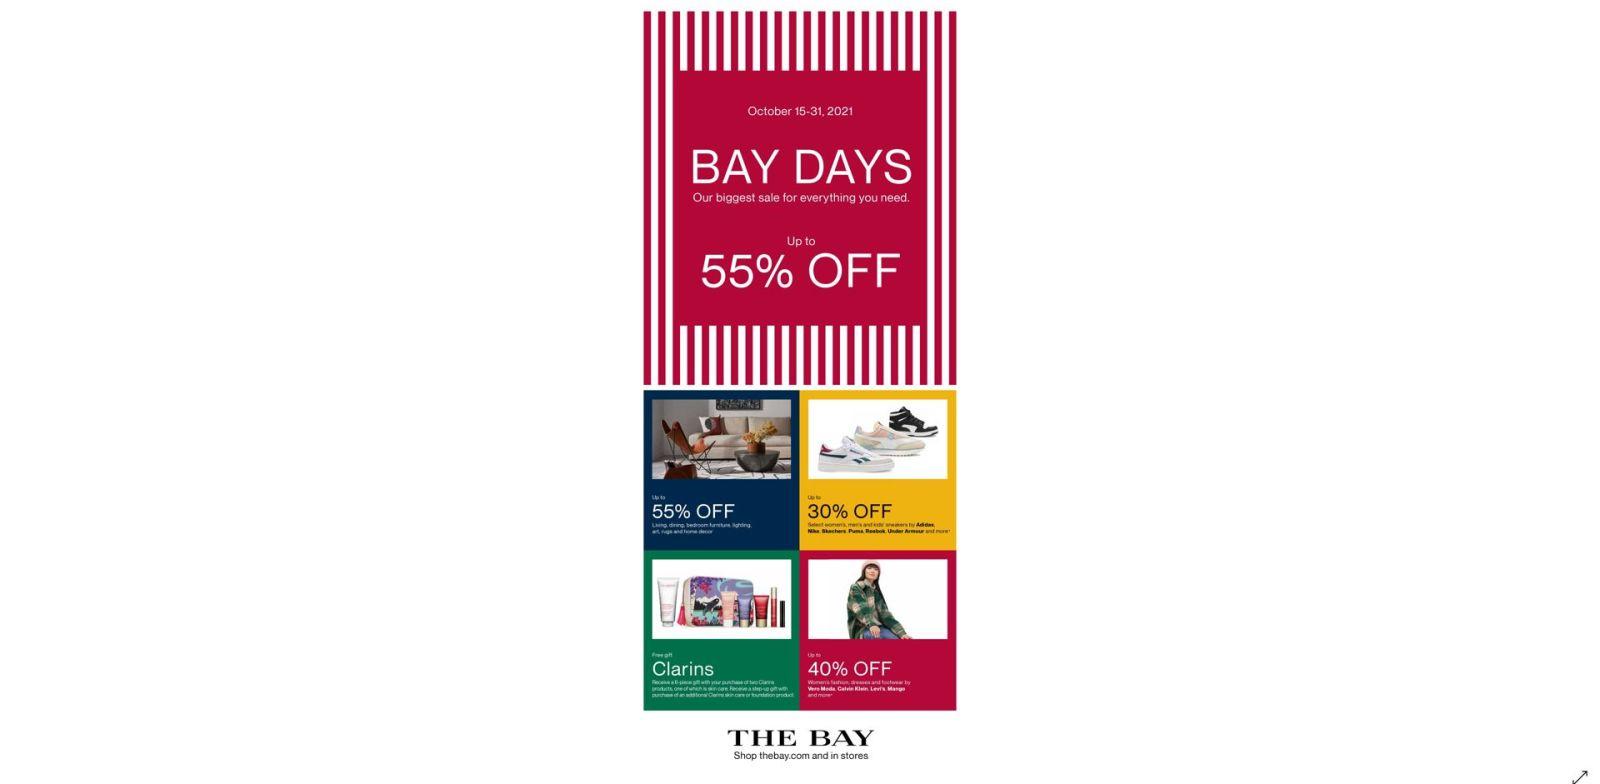 [Image] [offer] BAY DAYS    October 15 to 31, 2021